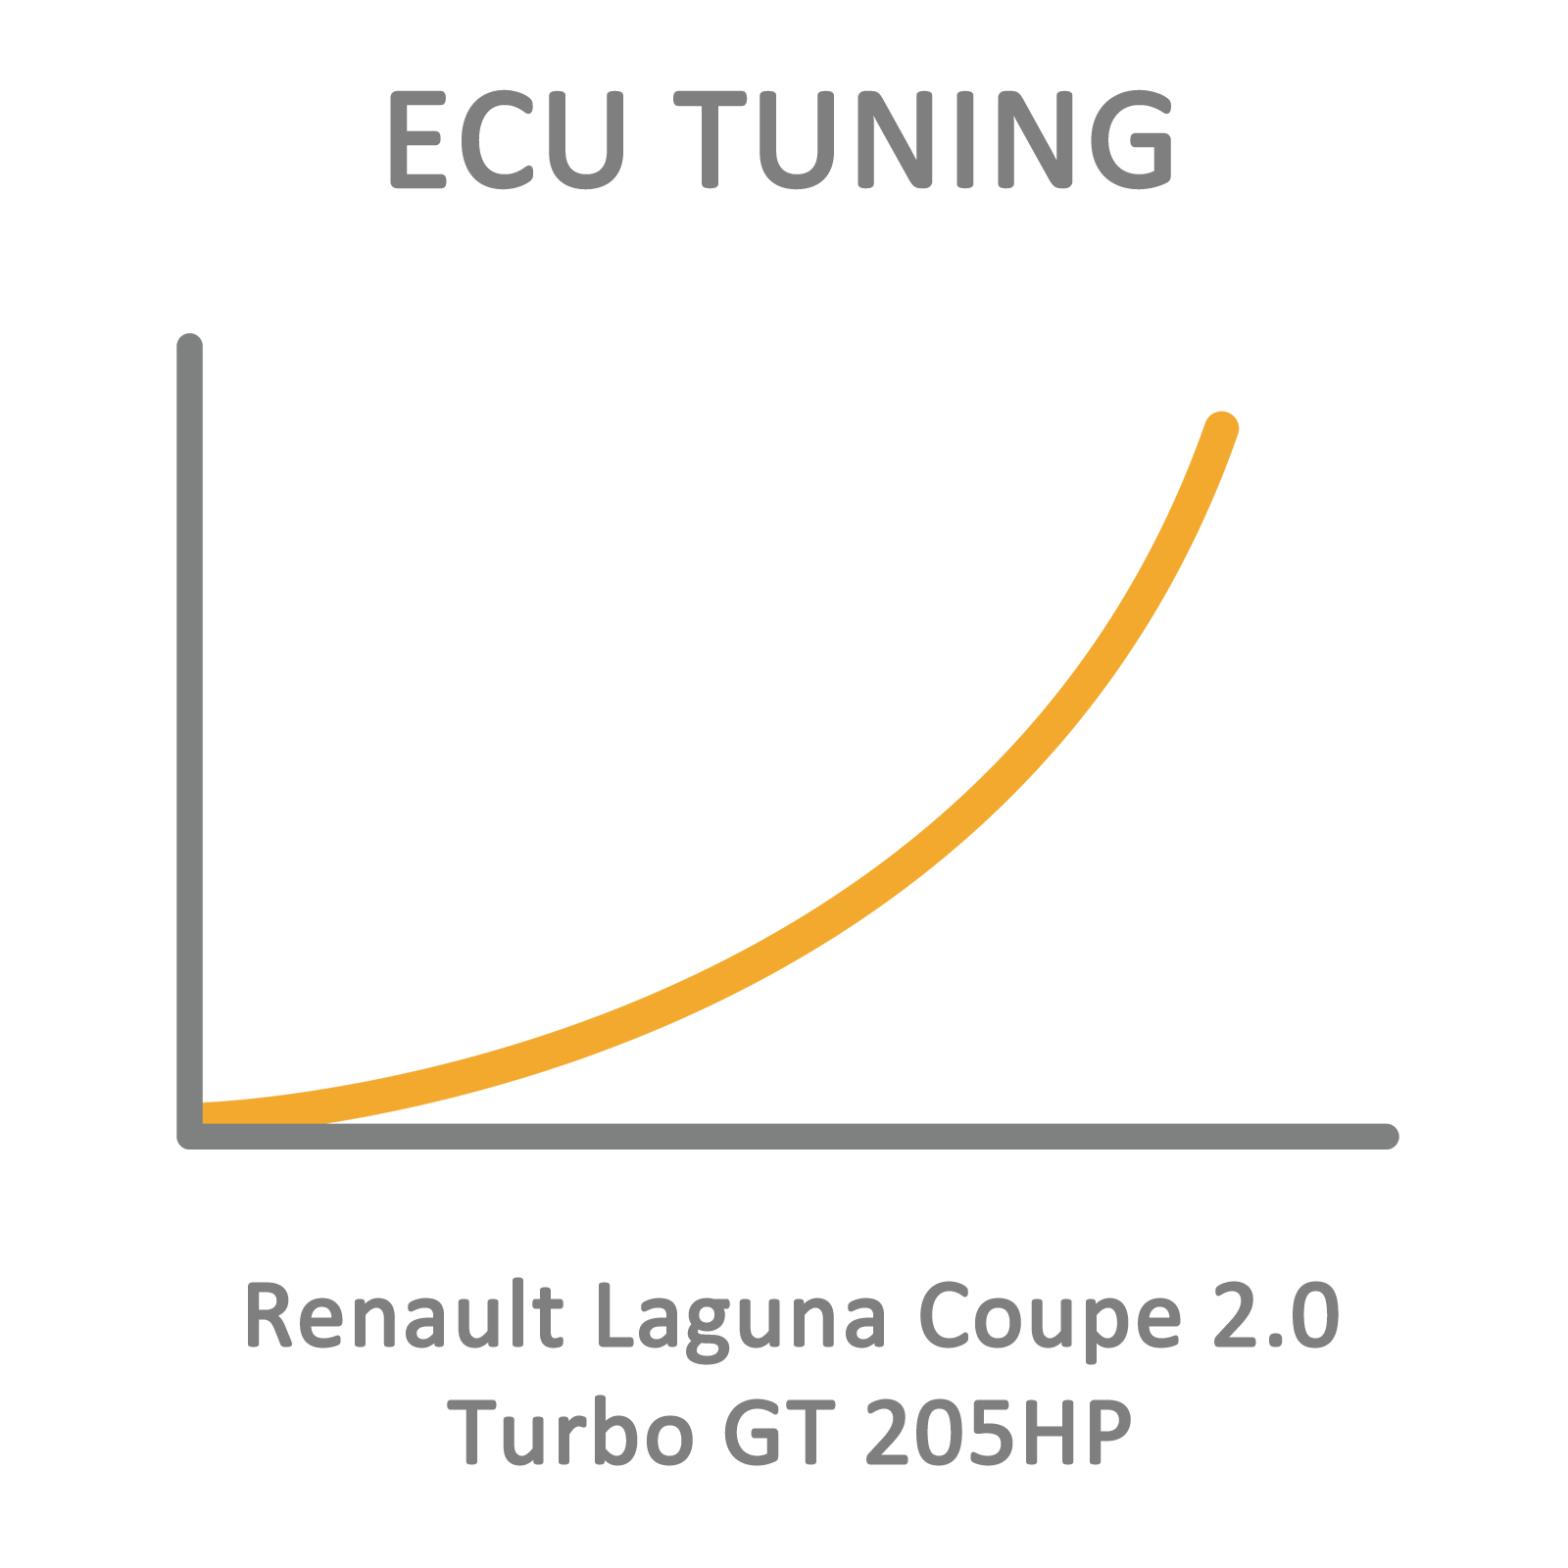 Renault Laguna Coupe 2.0 Turbo GT 205HP ECU Tuning